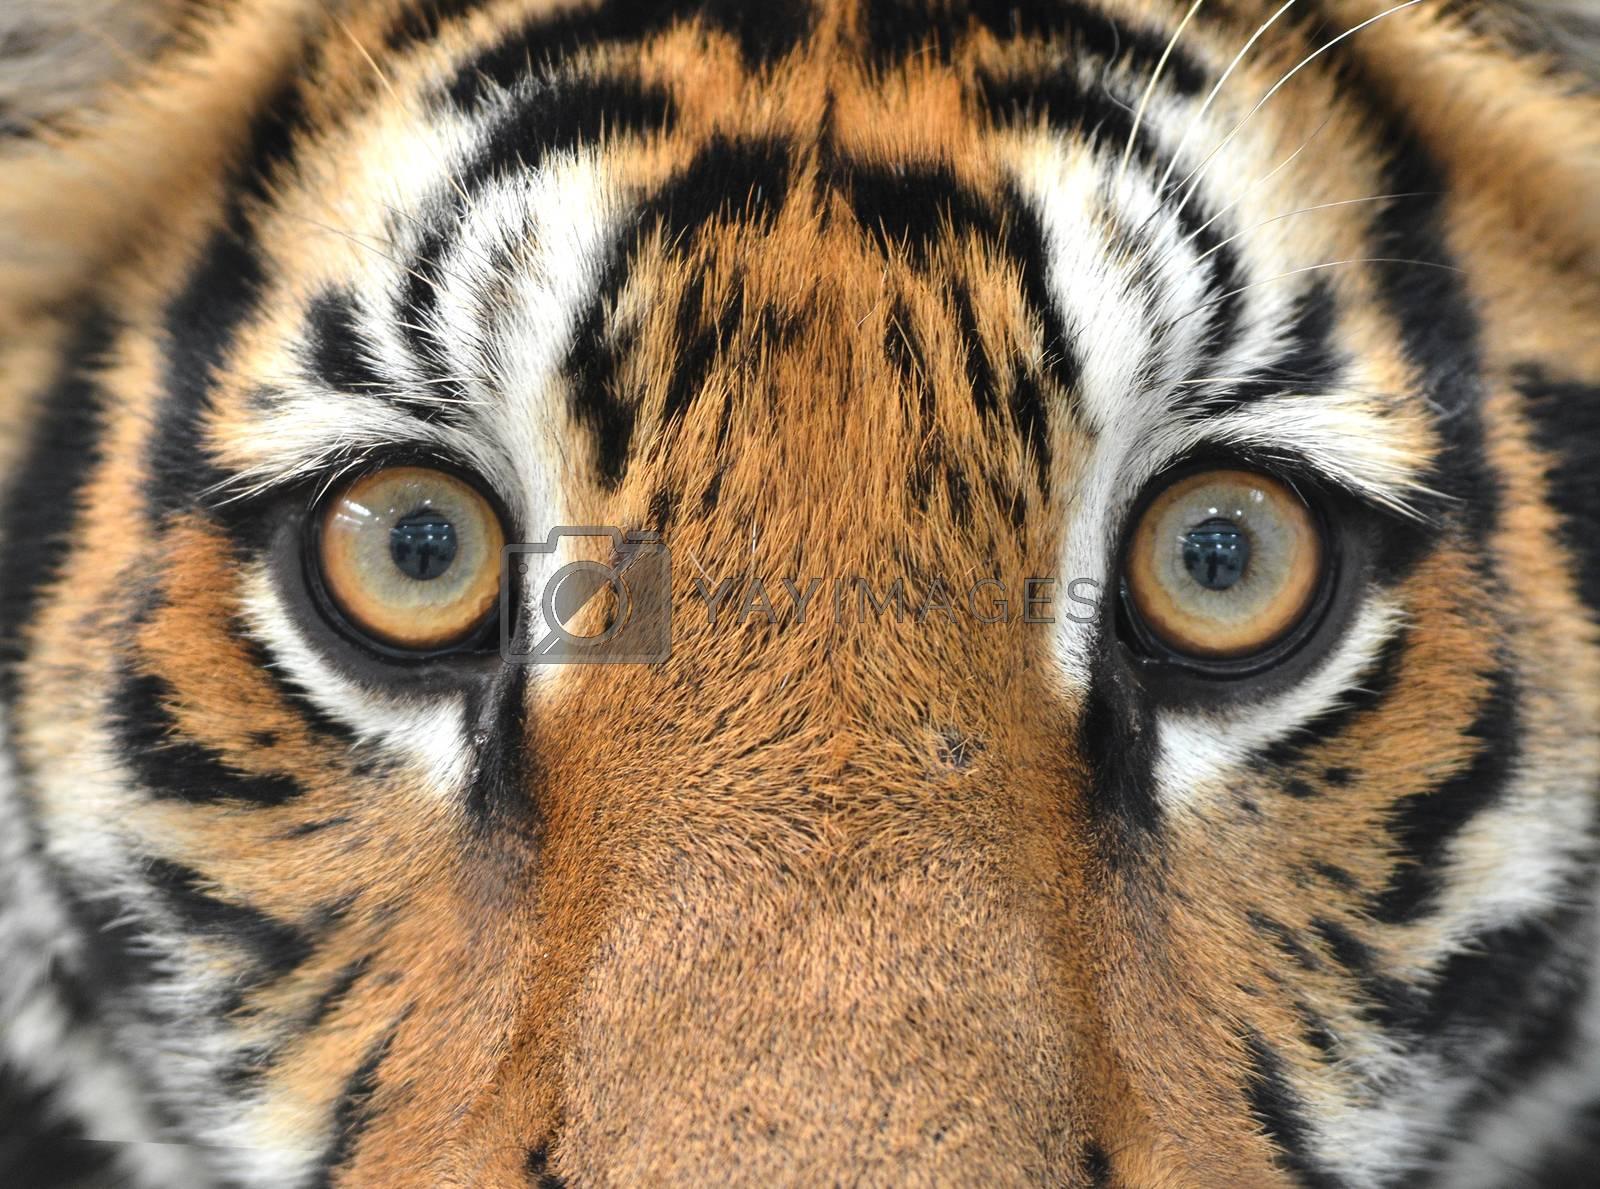 Royalty free image of bengal tiger eyes by anankkml